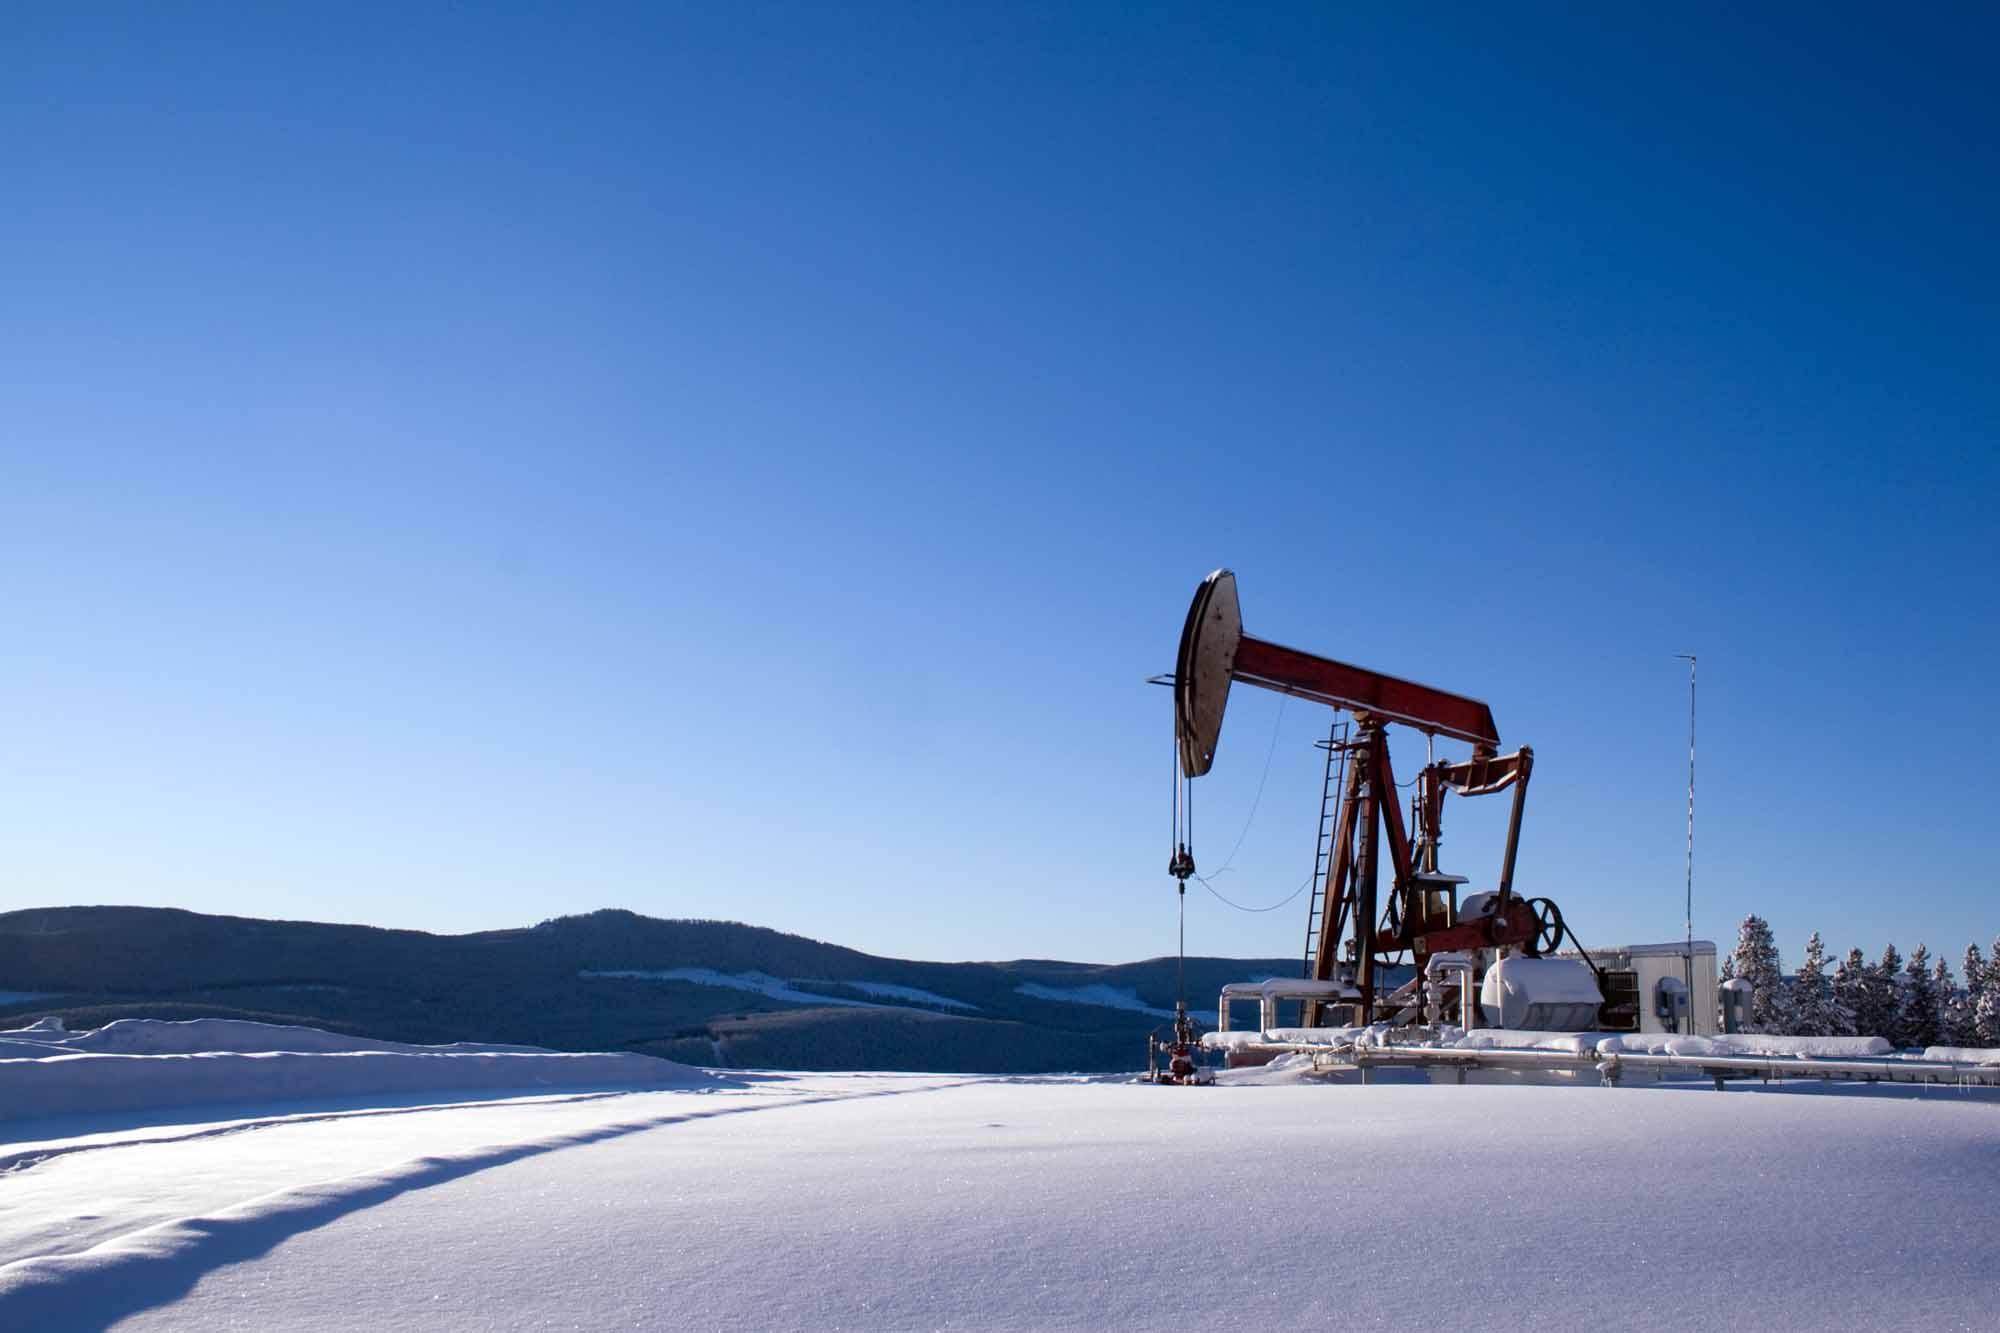 Oil well pumpjack mountain snow